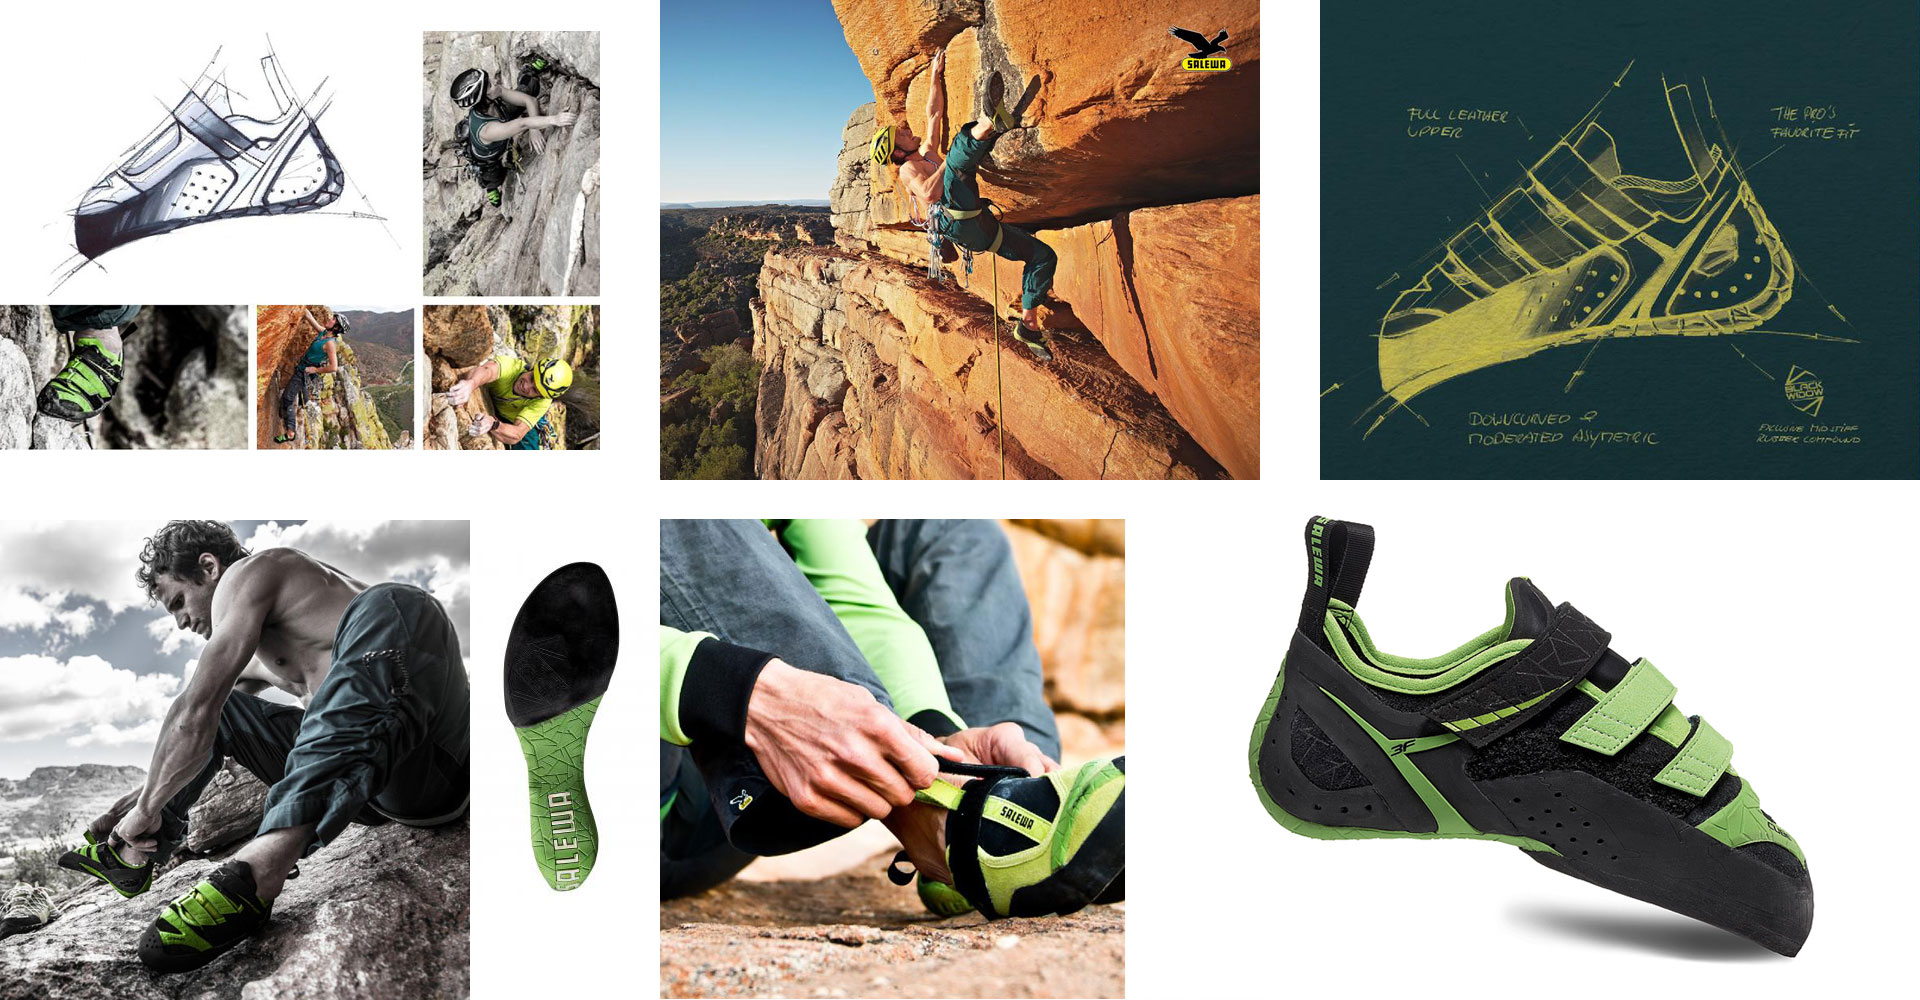 CUBE Climbing Shoes